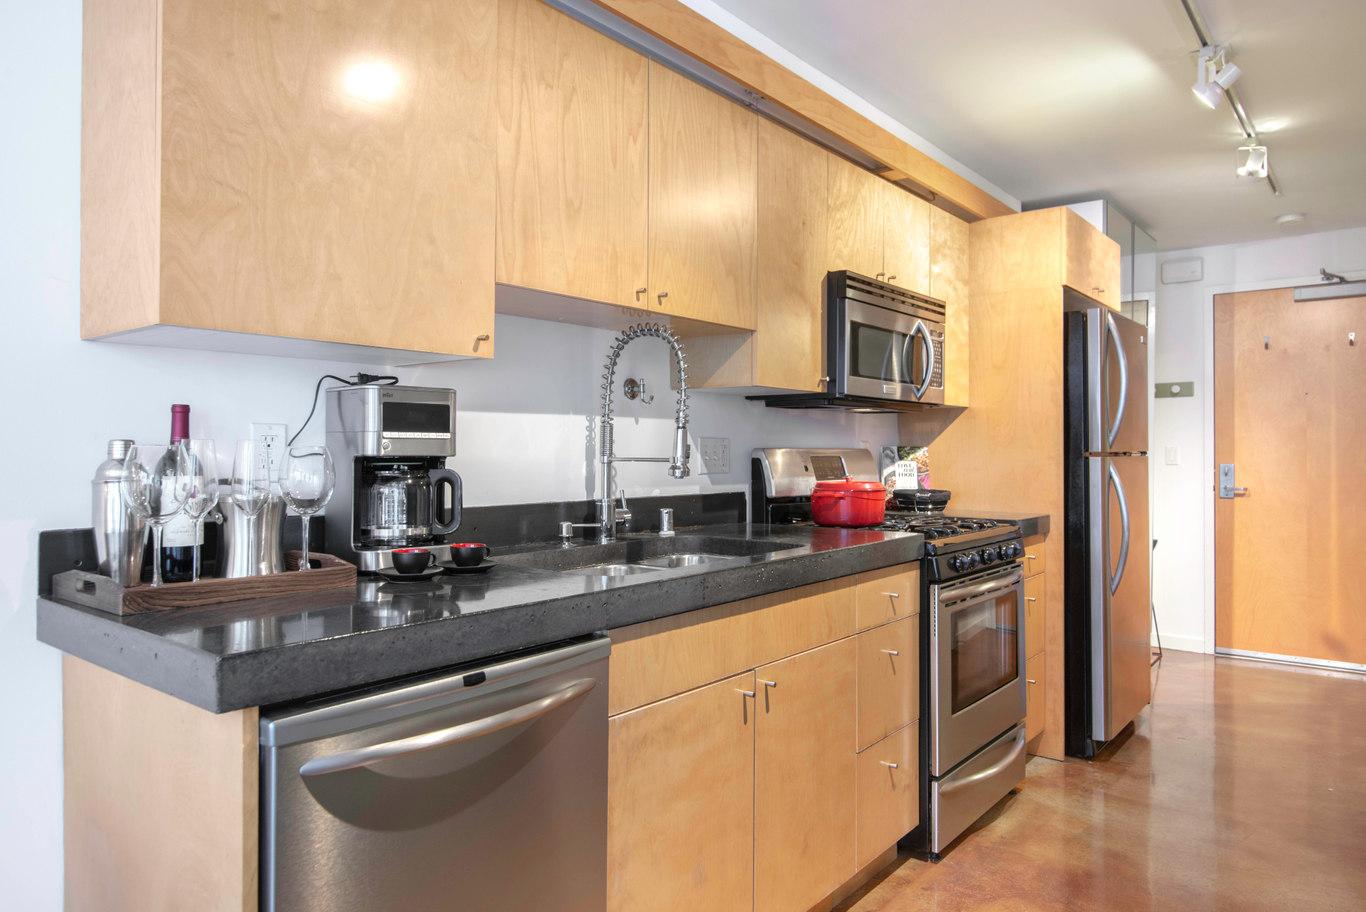 Kitchen at Glasdore Lofts Apartment